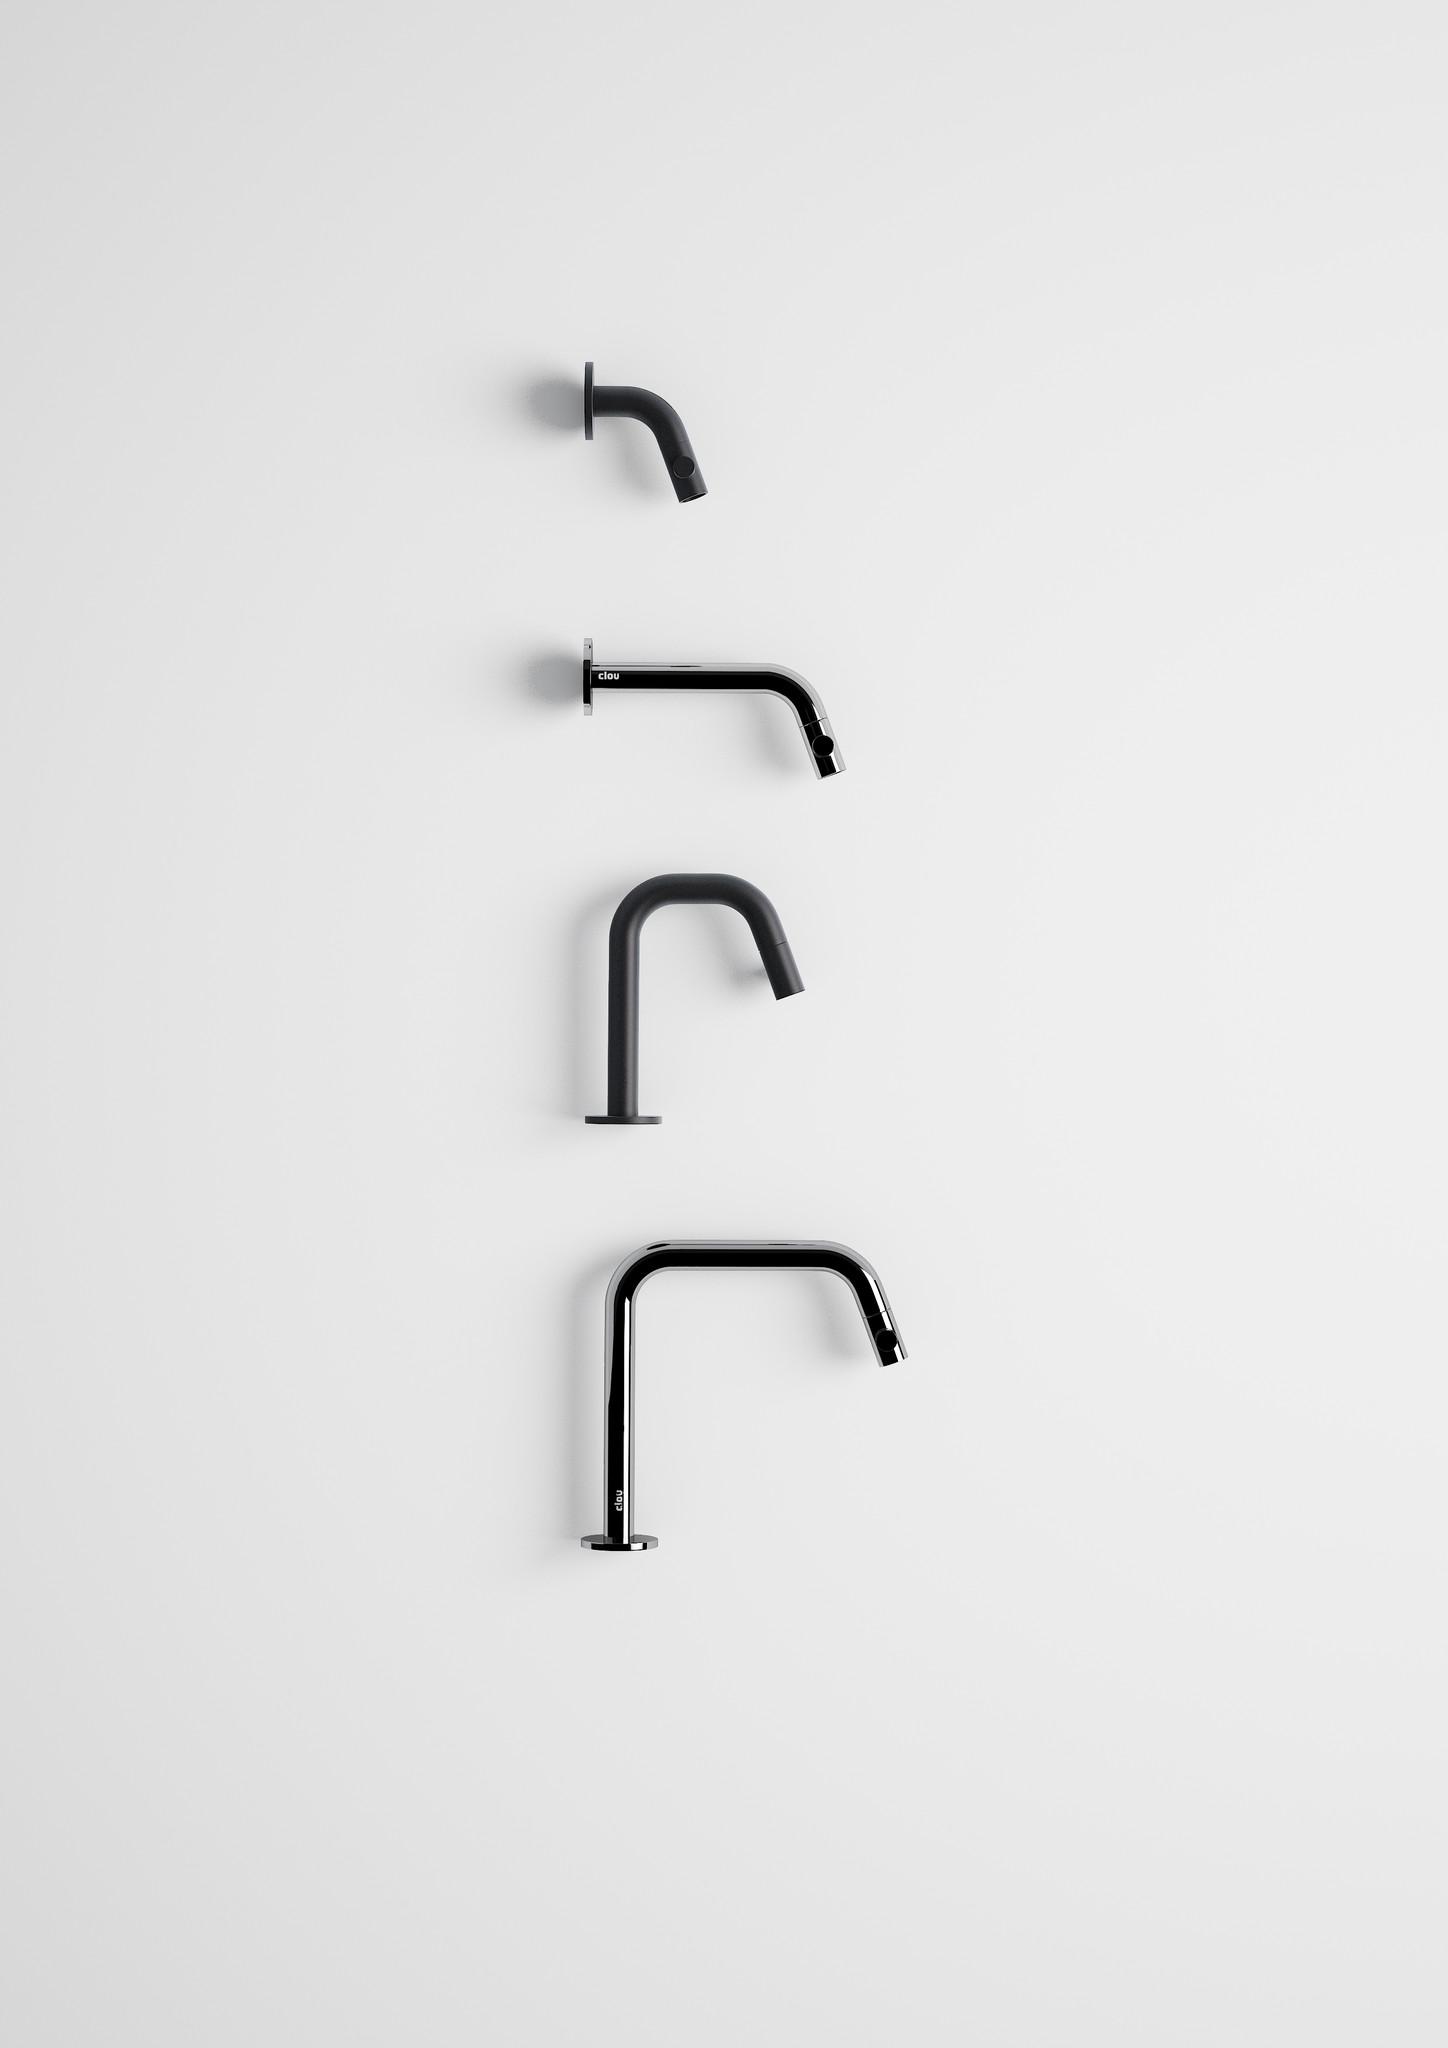 Kaldur fonteinkraan zwart